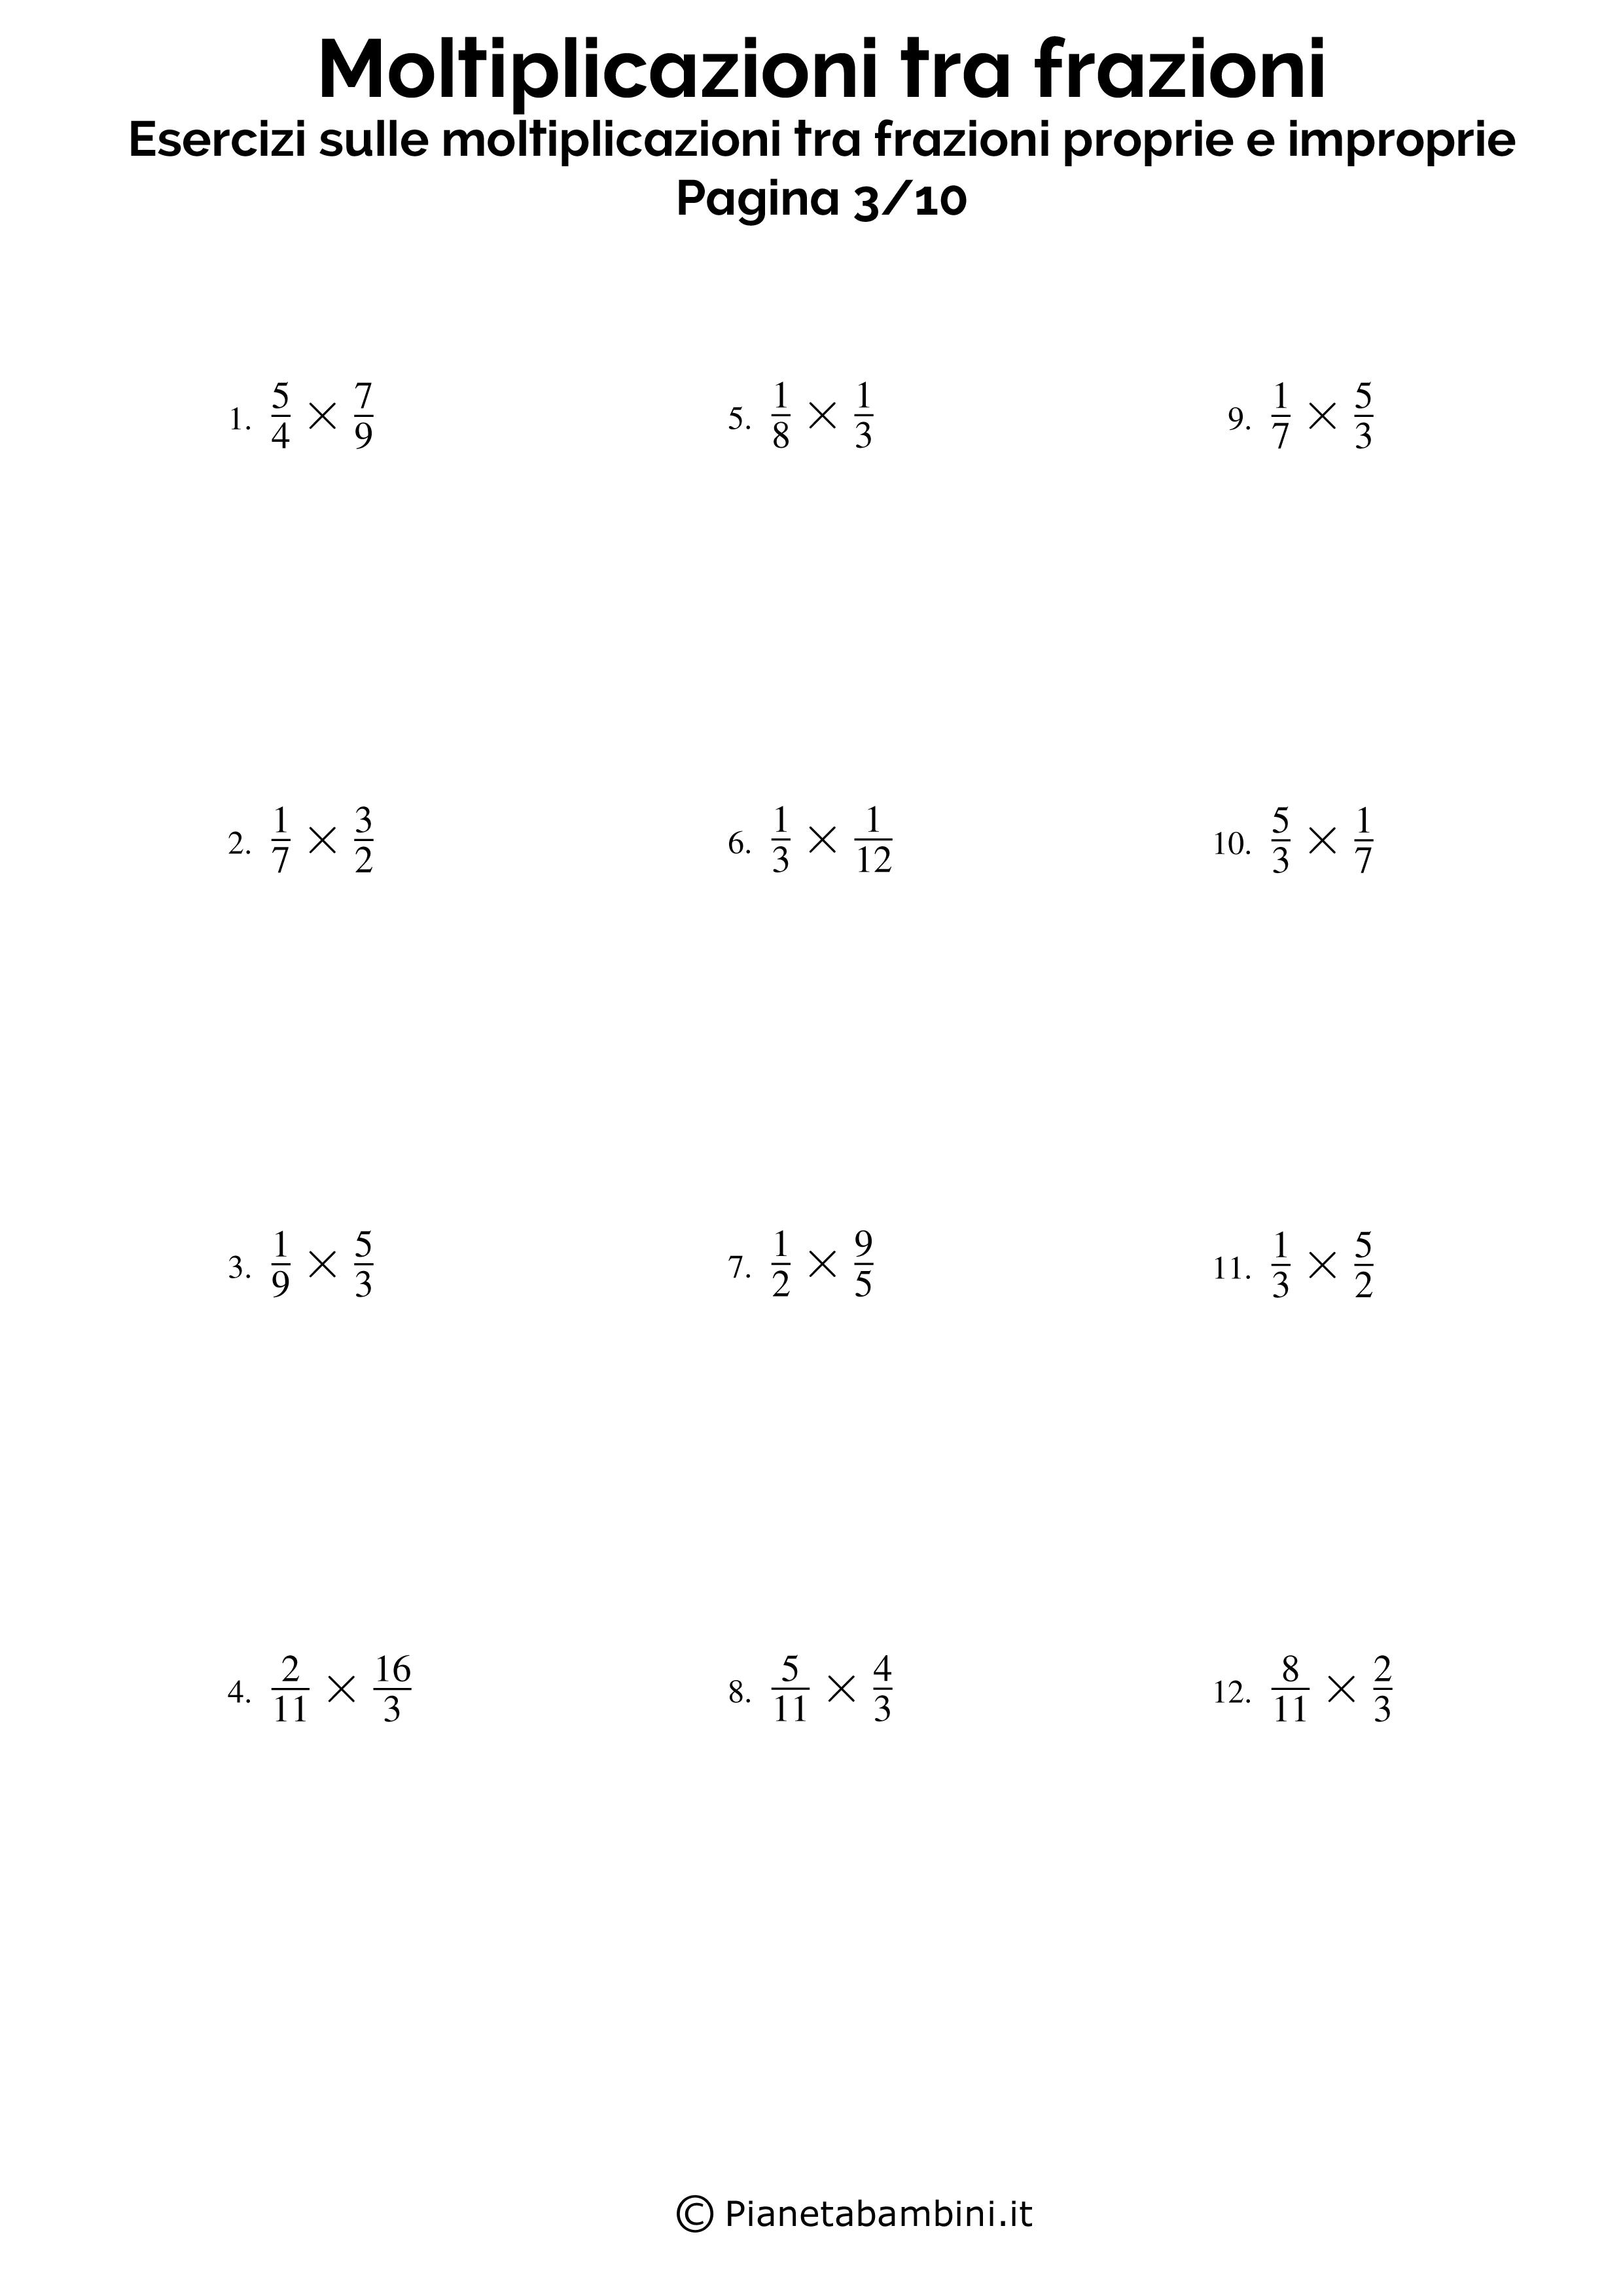 Moltiplicazioni-Frazioni-Proprie-Improprie_03